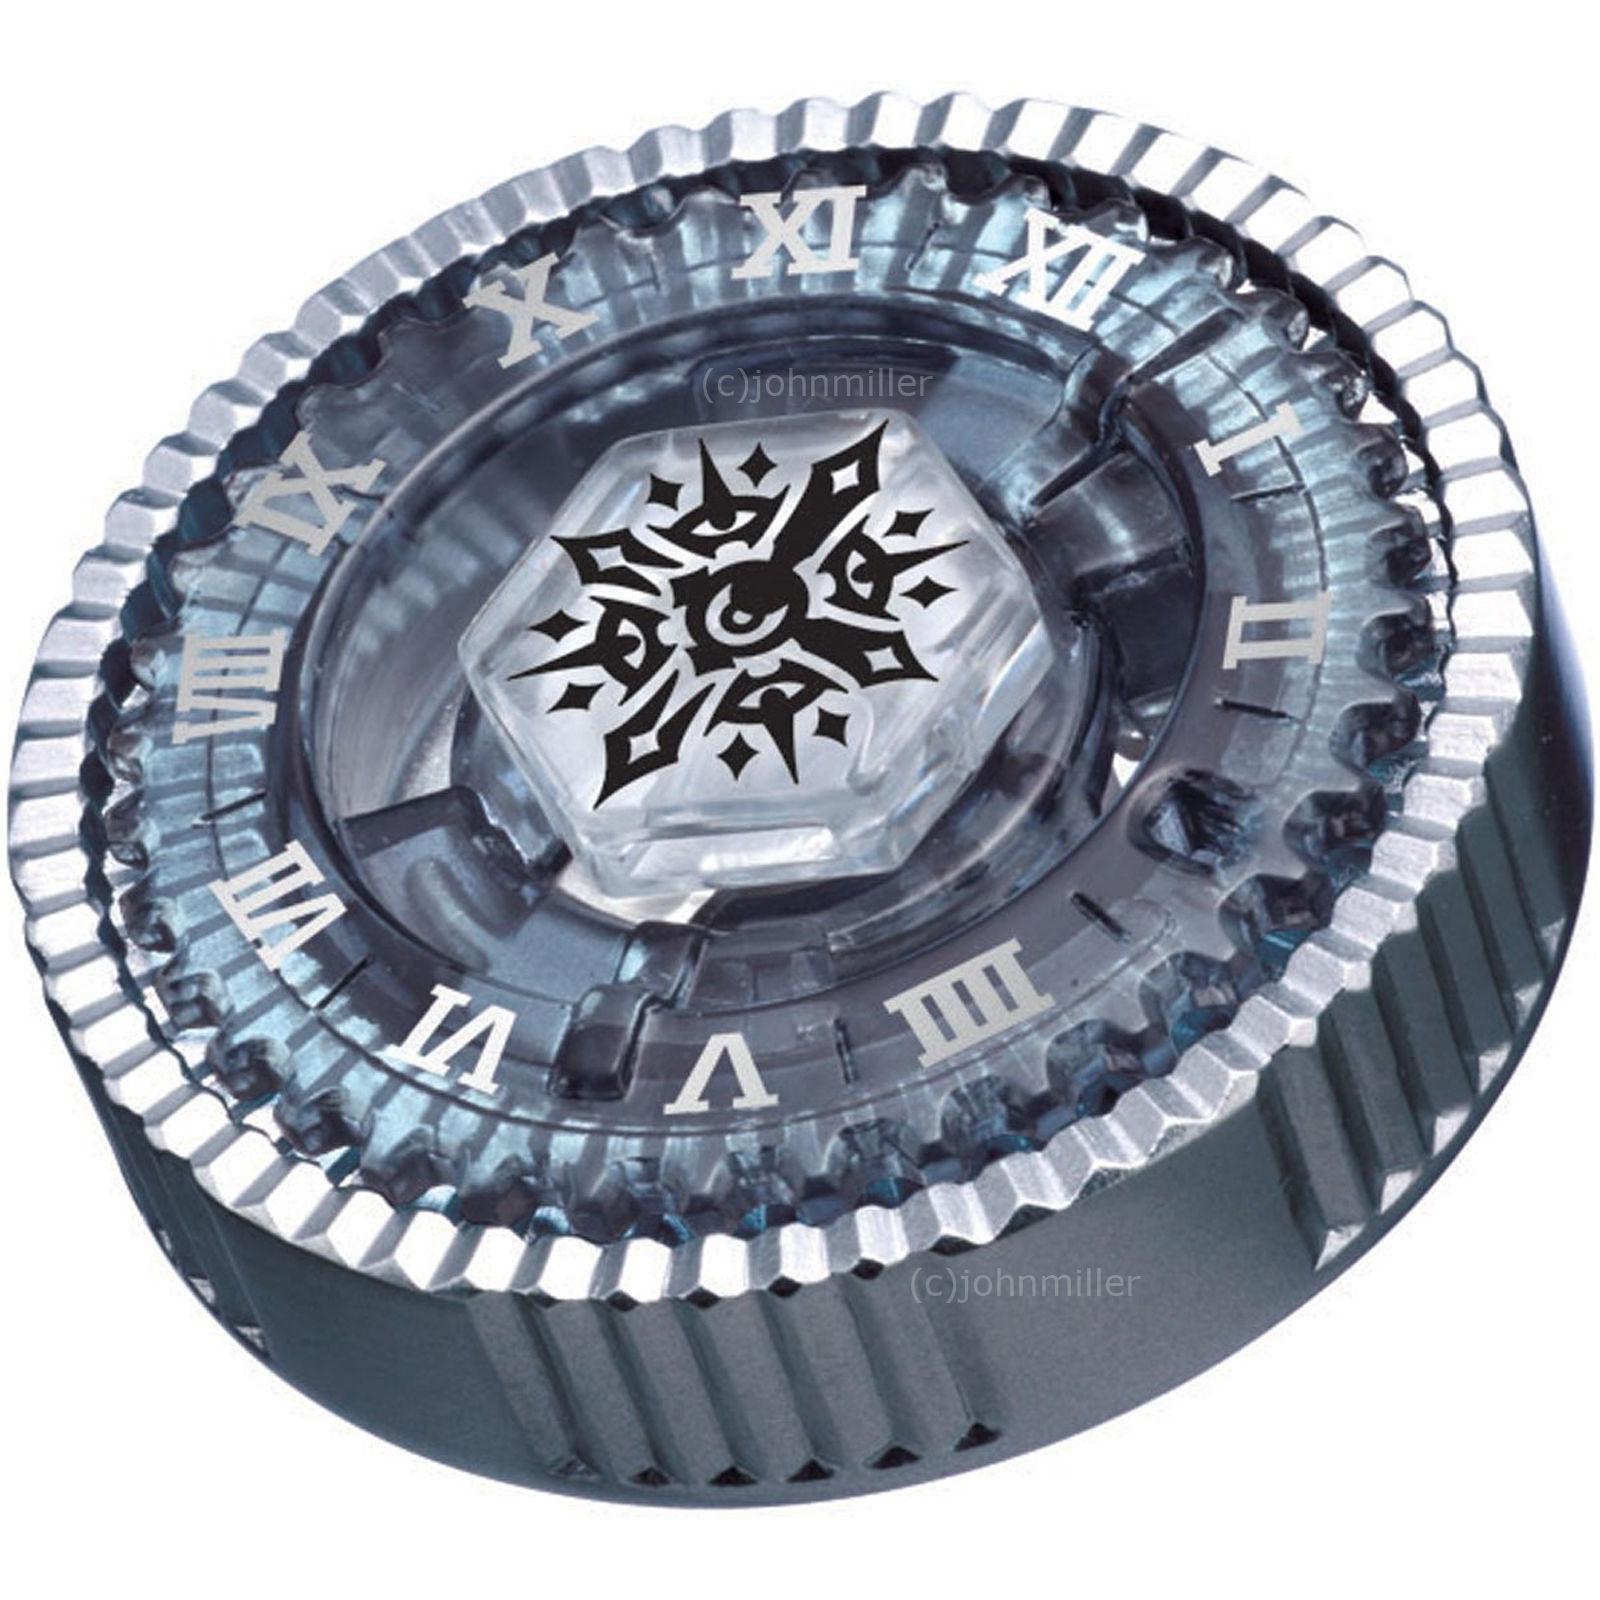 Mnotht Toy Beyblade Metal Fusion BB104 Beyblade Twisted Tempo / Basalt Horogium med Launcher TV, Film & Tecken Leksaker Barn Present